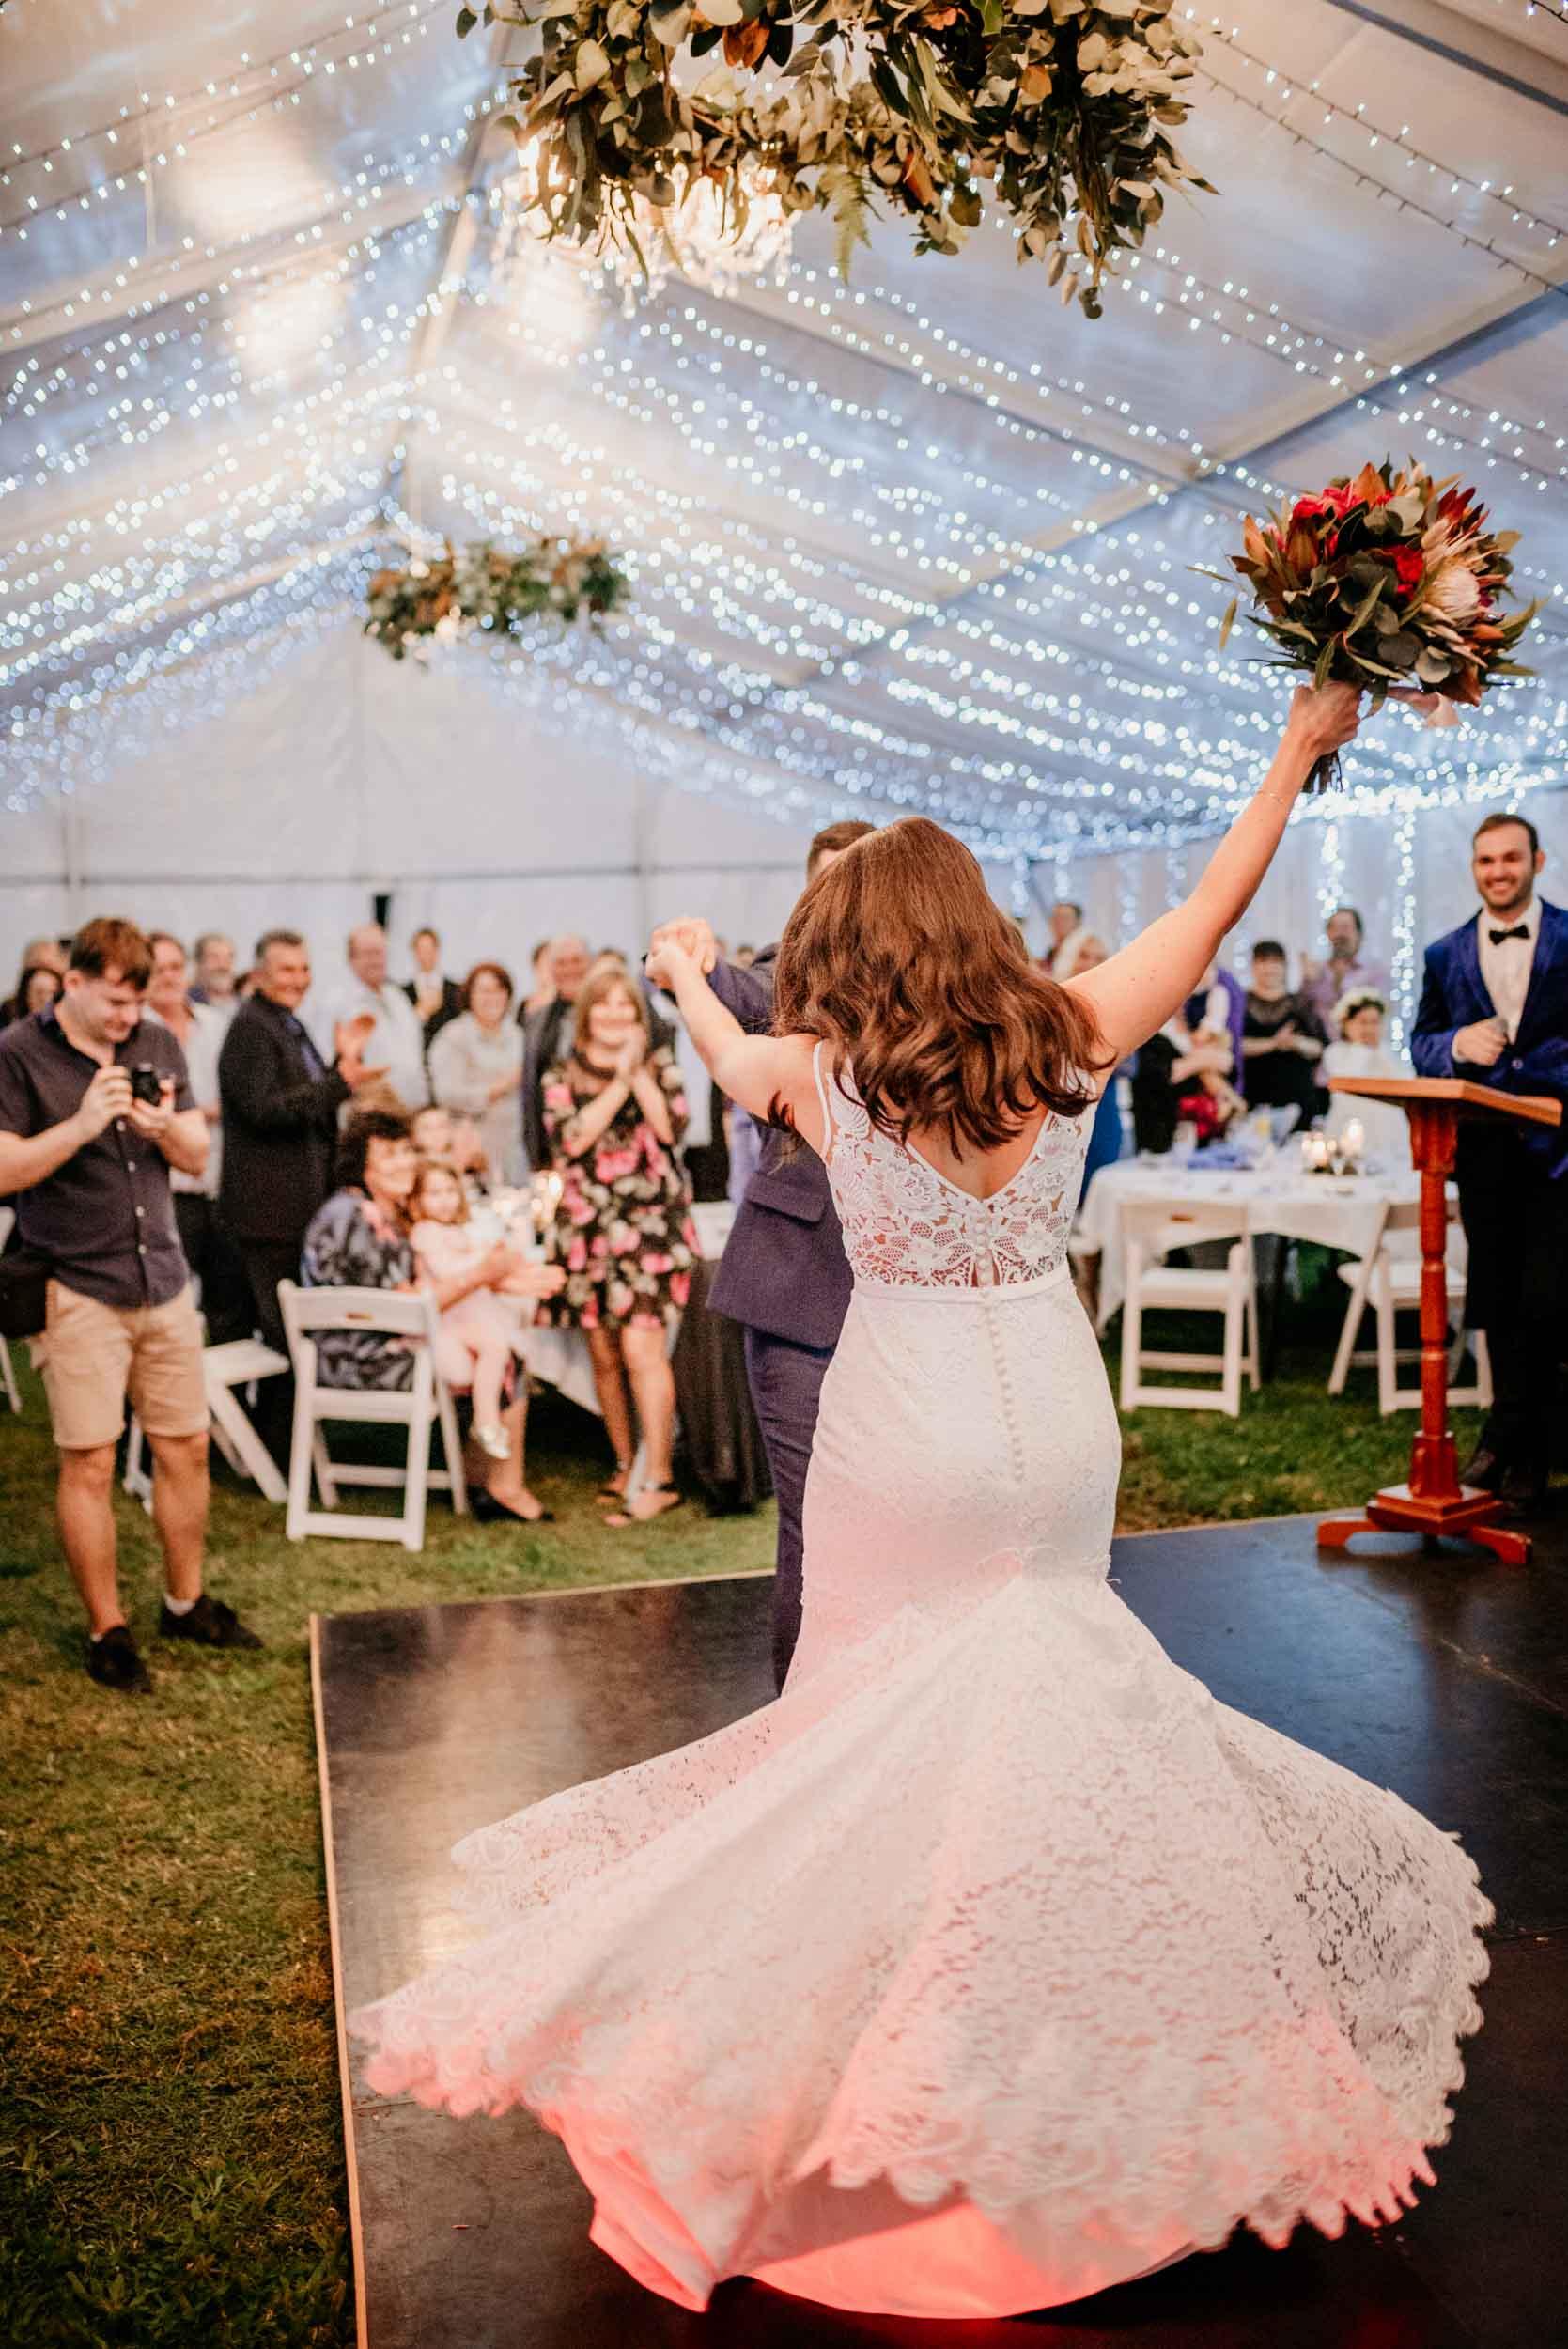 The Raw Photographer - Cairns Wedding Photographer - Atherton Tablelands - Mareeba farm Wedding - Irene Costa's Devine Bridal - Candid - Photo Package-54.jpg